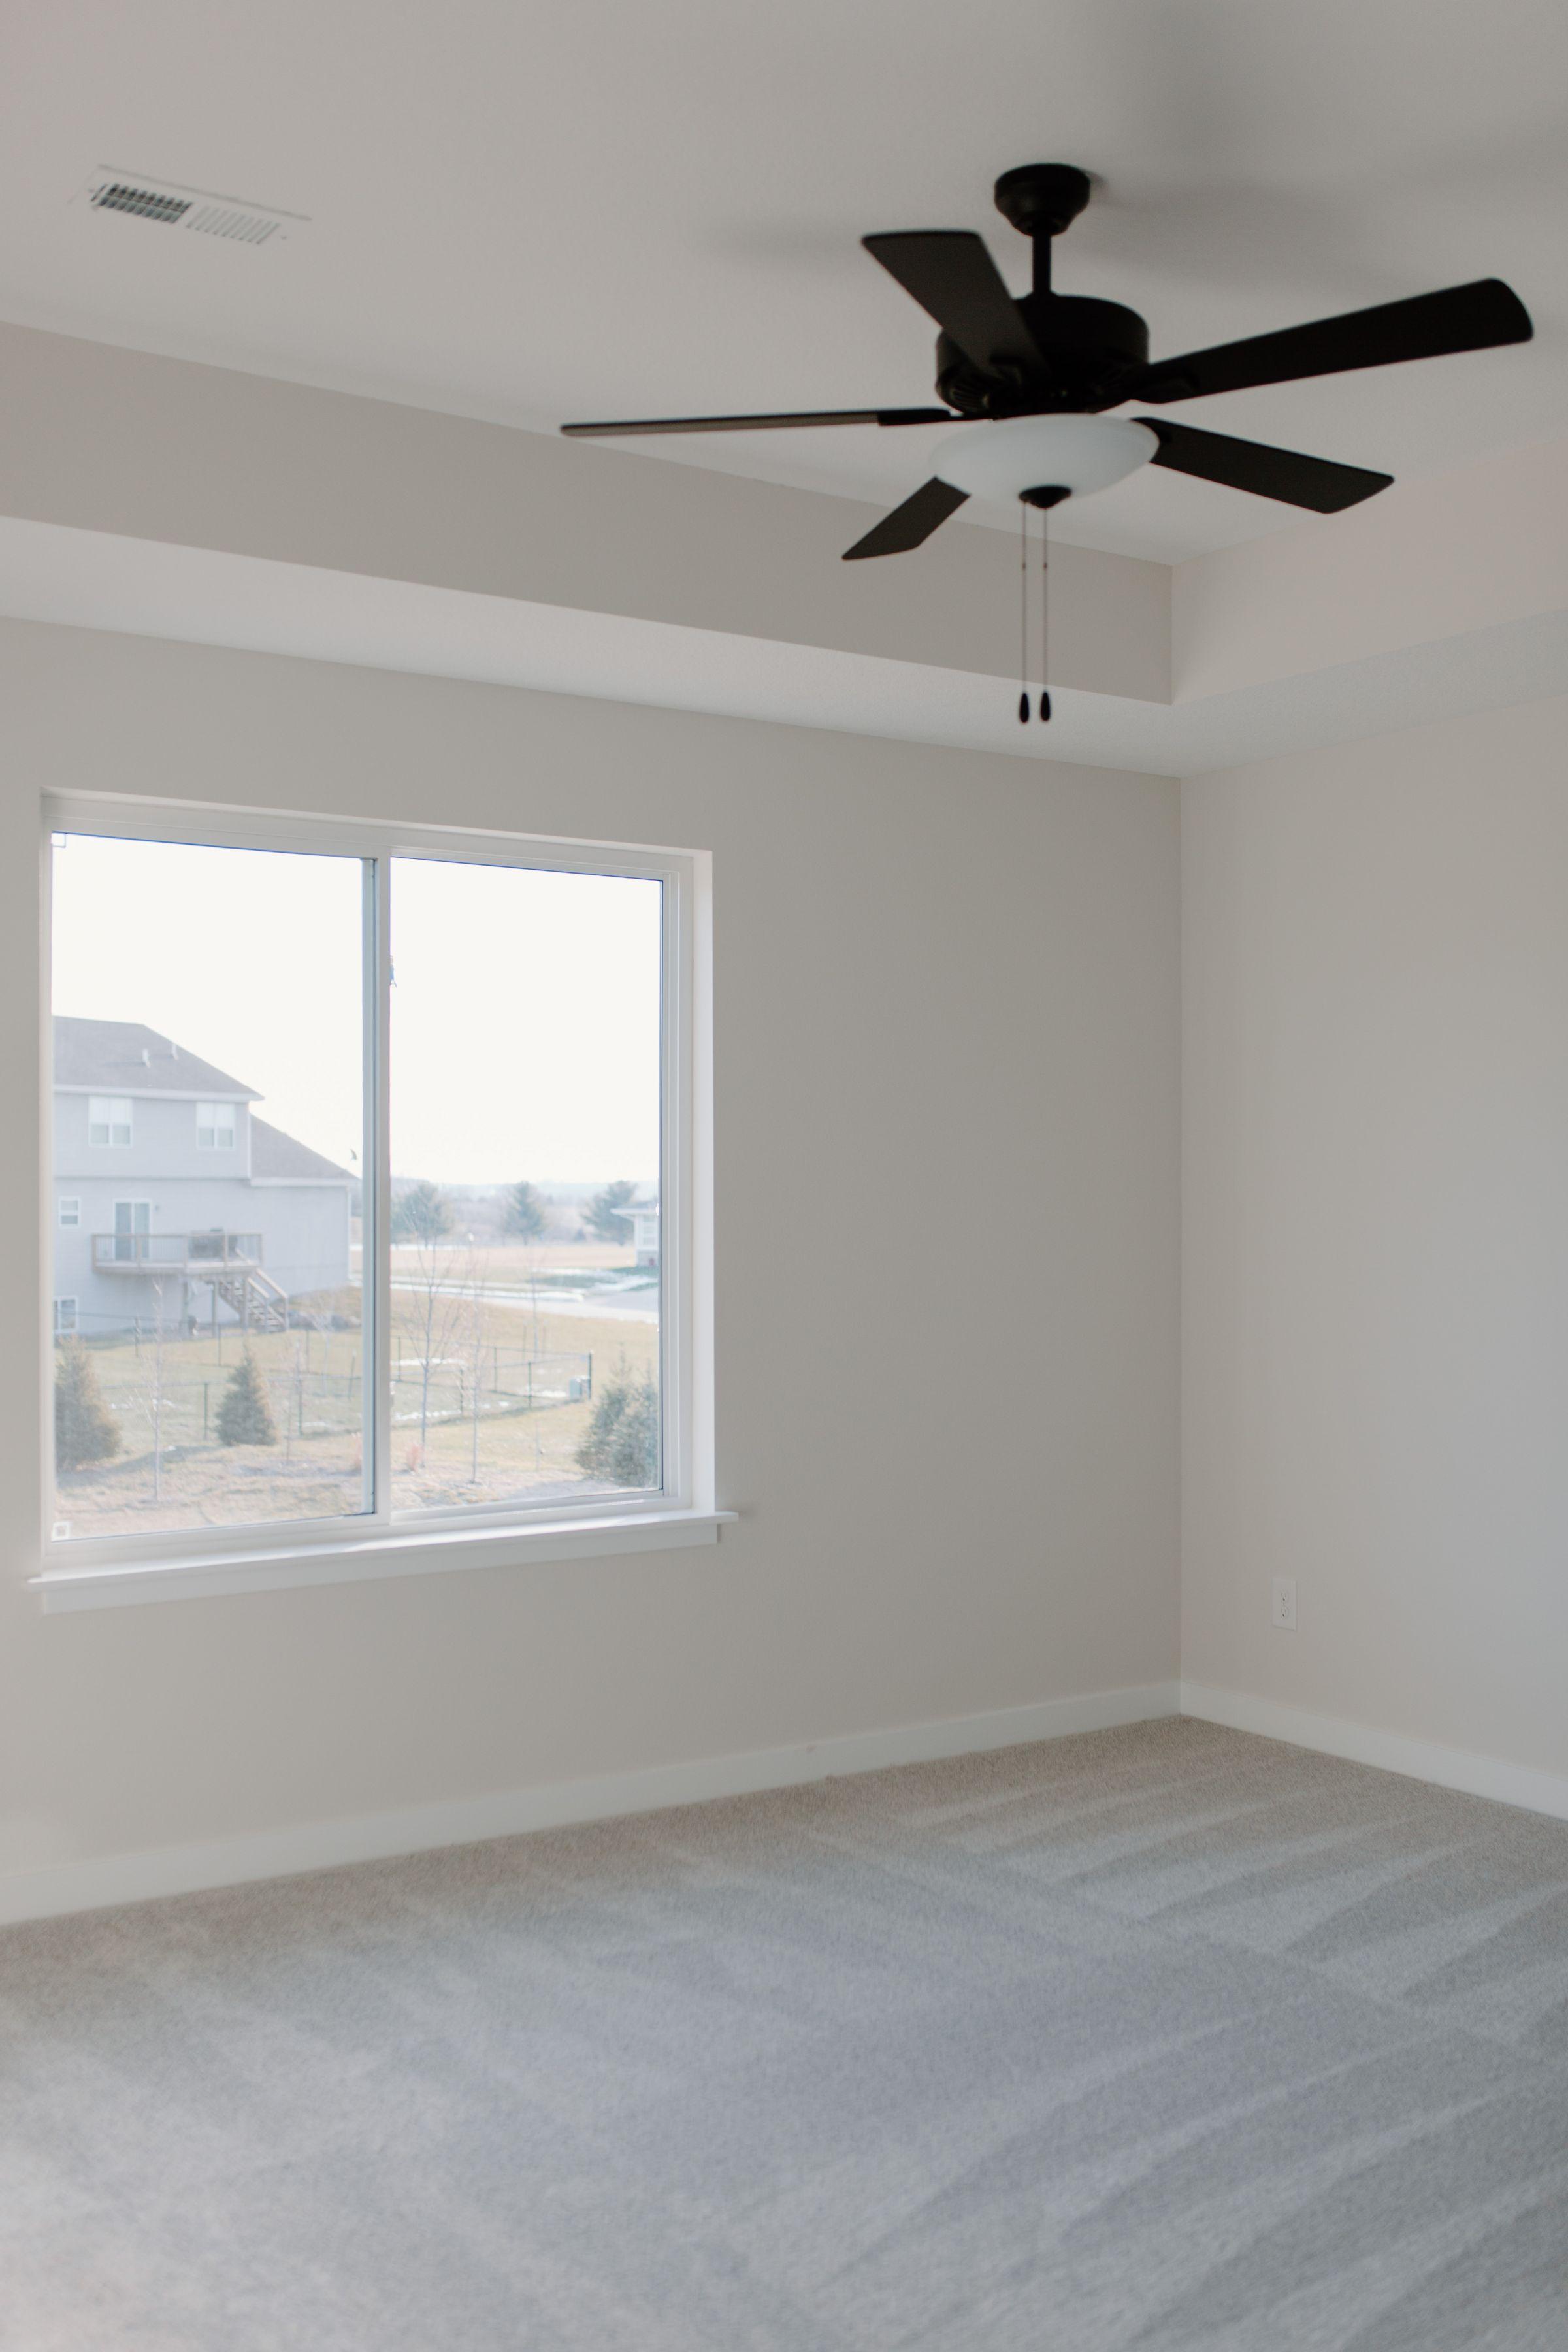 residential-warren-county-iowa-0-acres-listing-number-15366-10-2021-02-18-165327.jpg